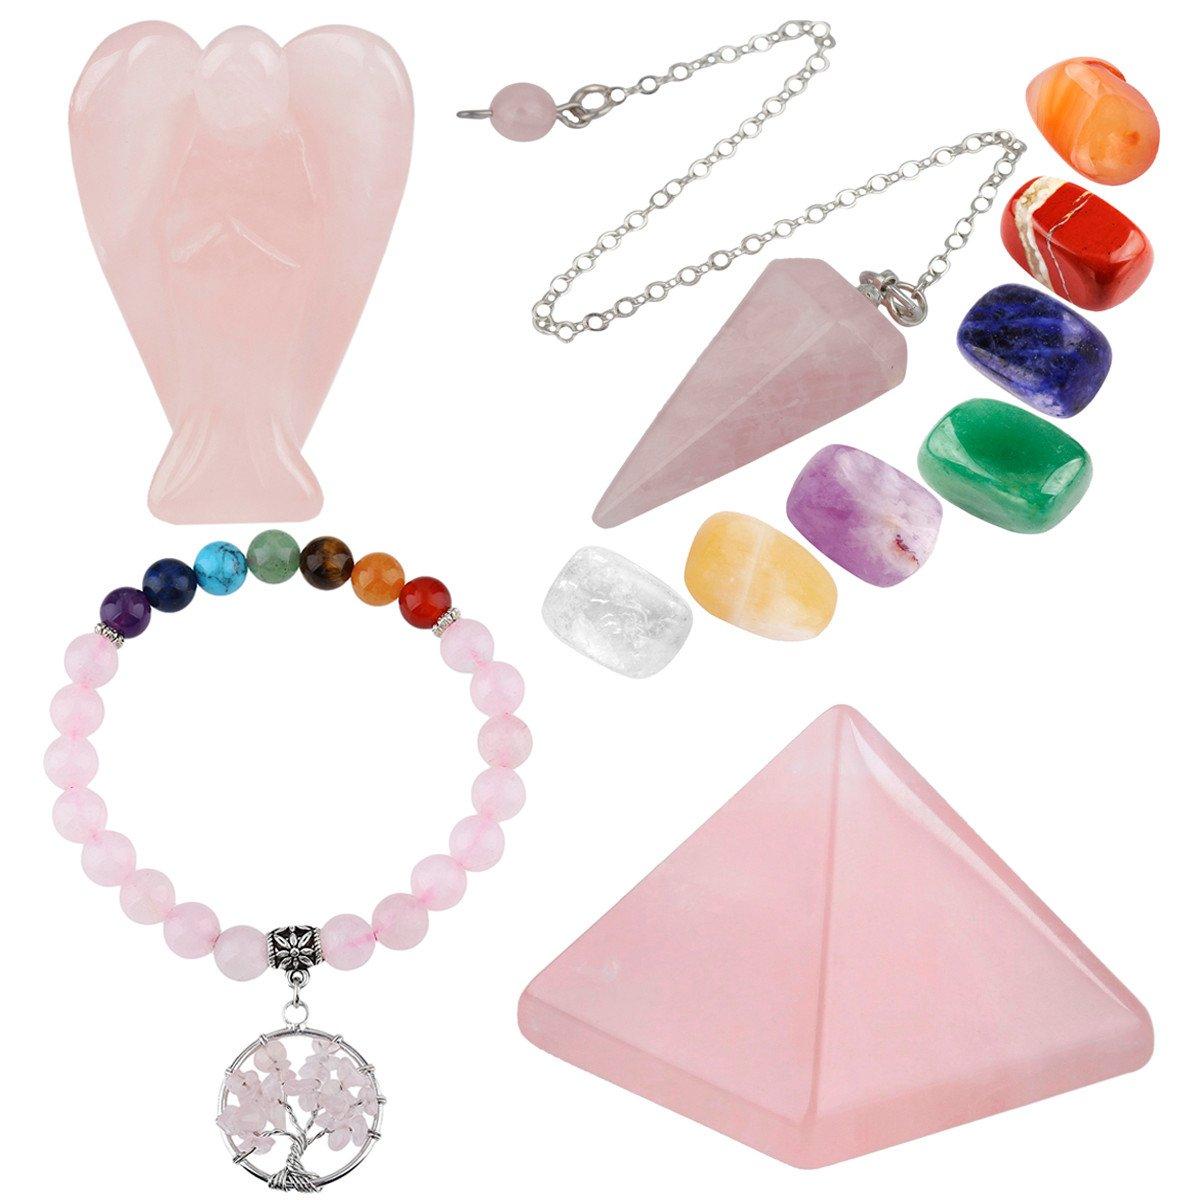 mookaitedecor Rose Quartz Healing Crystals Set, 7 Chakra Bracelet, Palm Stones, Pendulum, Pocket Guardian Angel, Pyramid Meditation Kits for Reiki,Balancing